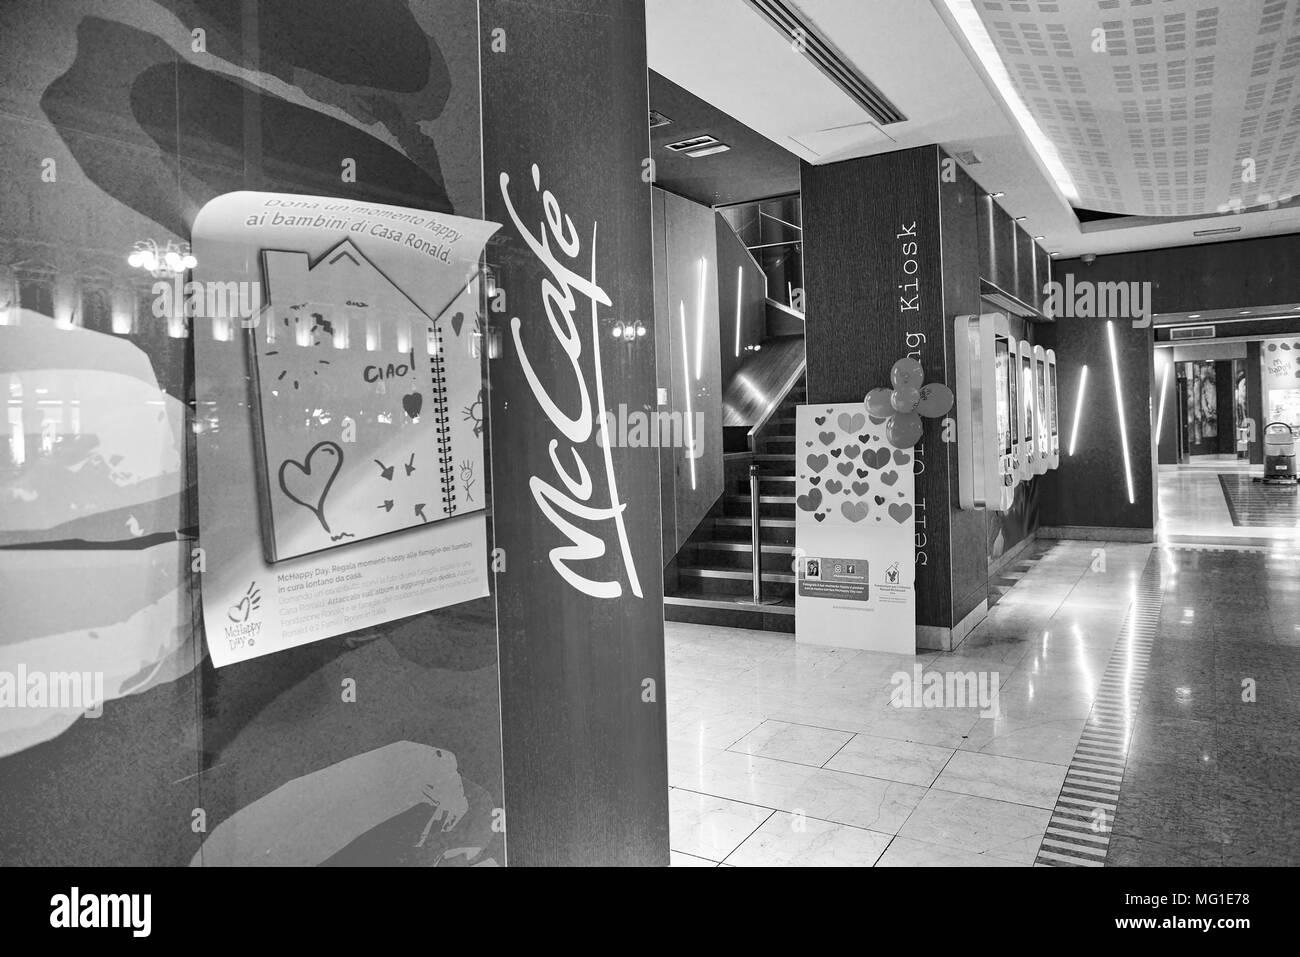 MILAN, ITALY - CIRCA NOVEMBER, 2017: McDonald's restaurant interior. McDonald's is an American hamburger and fast food restaurant chain. - Stock Image